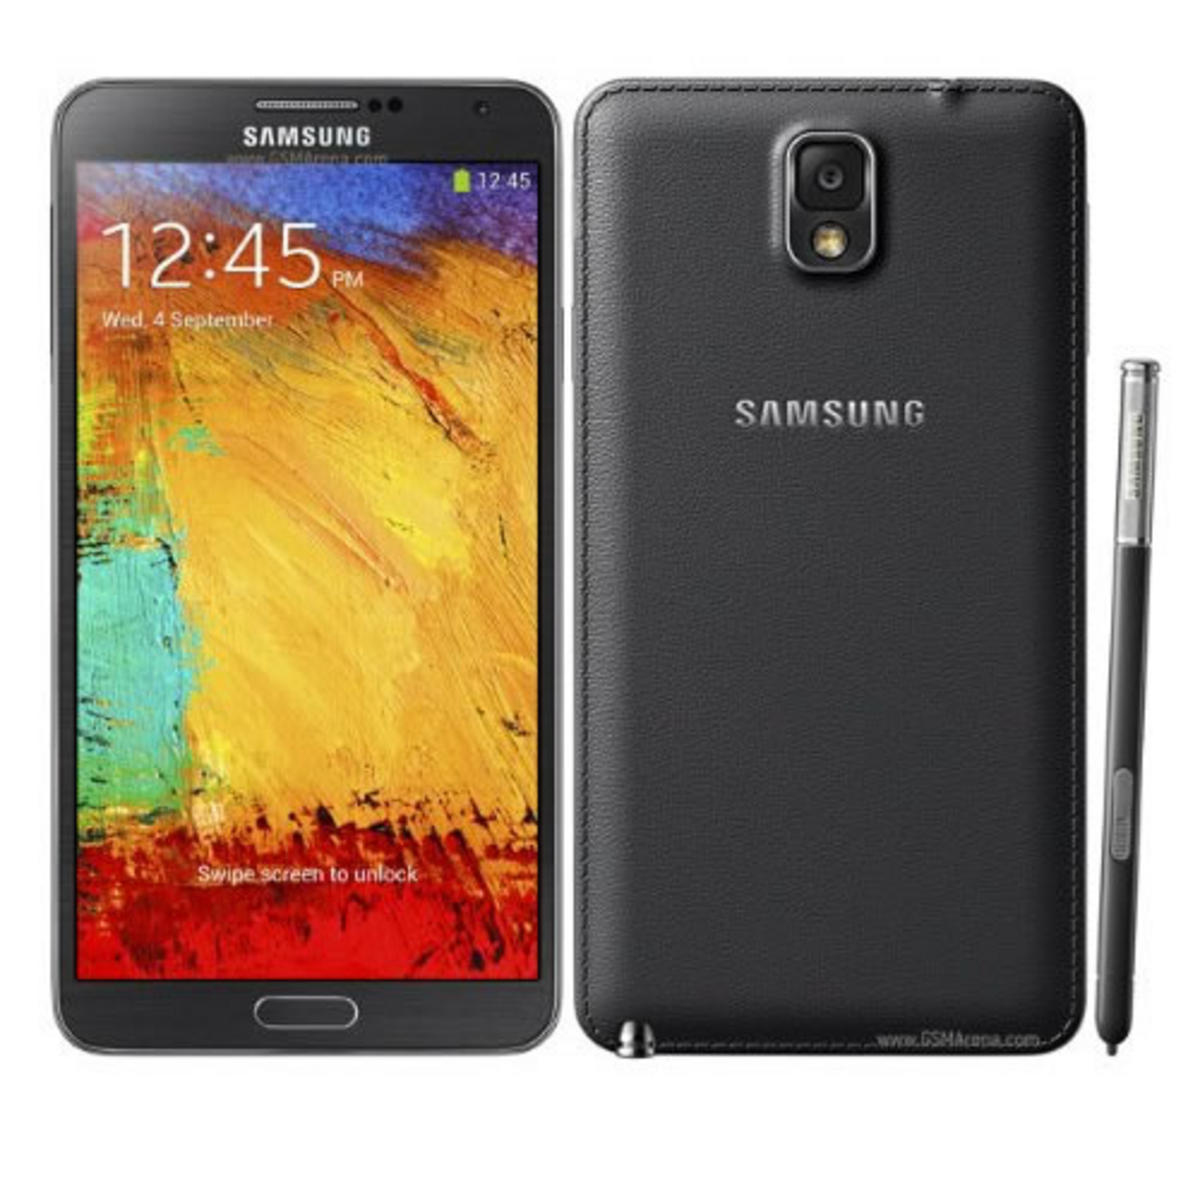 Lemcell Tutoriais Esquema Eltrico Samsung Galaxy Note 3 Sm N9005 Circuit Diagram Manual De Servio